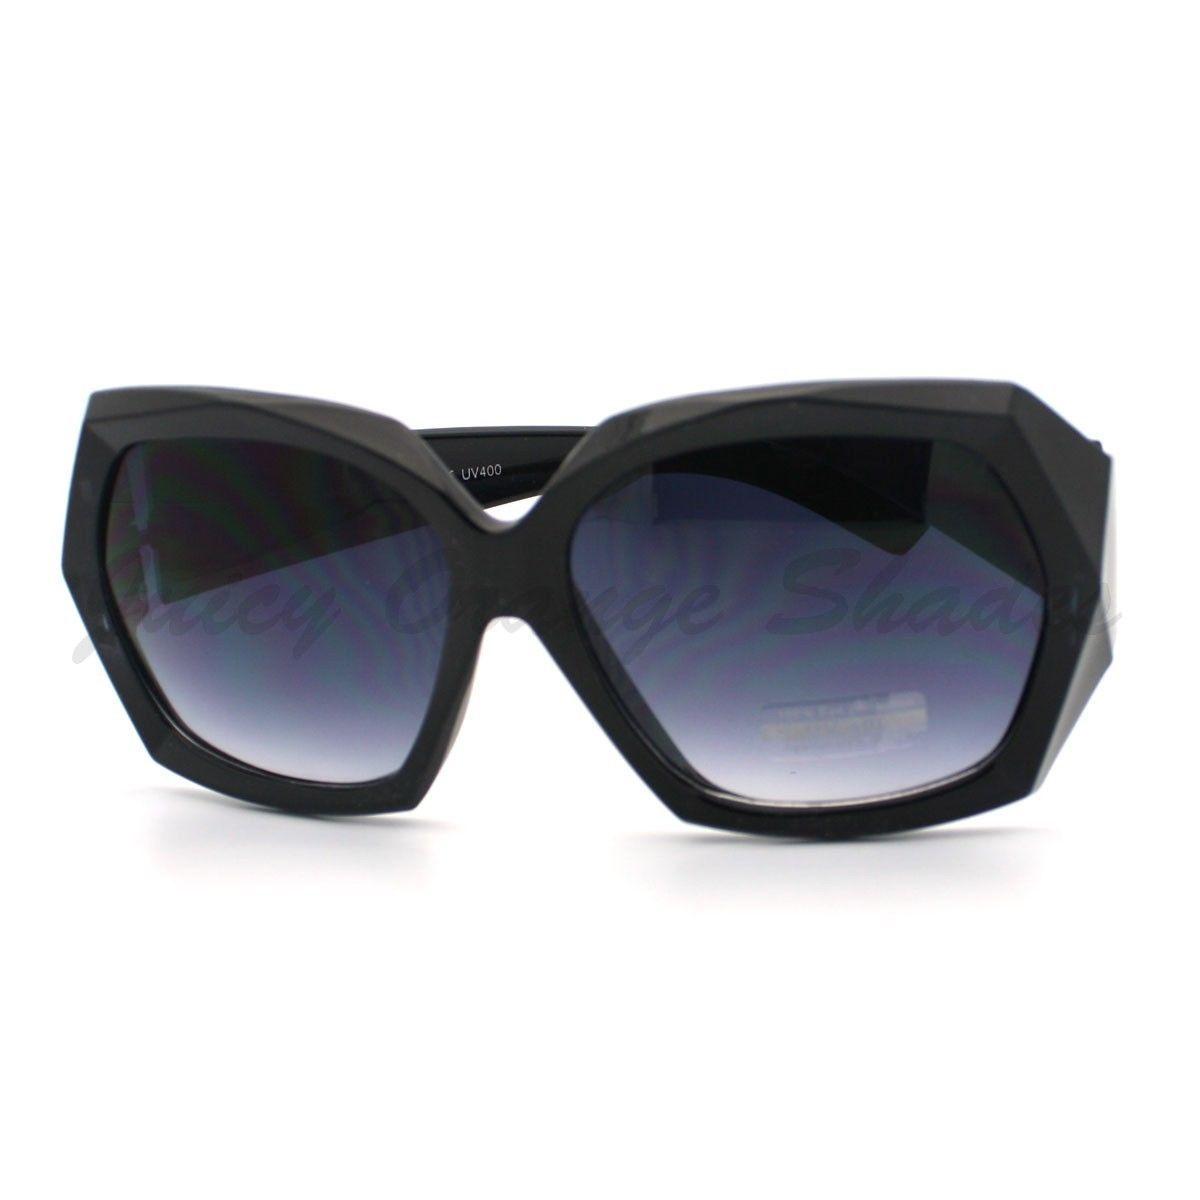 36644c924a3 Diamond Cut Design Womens Sunglasses Oversize Square Fashion Frame BLACK -  £6.11 GBP